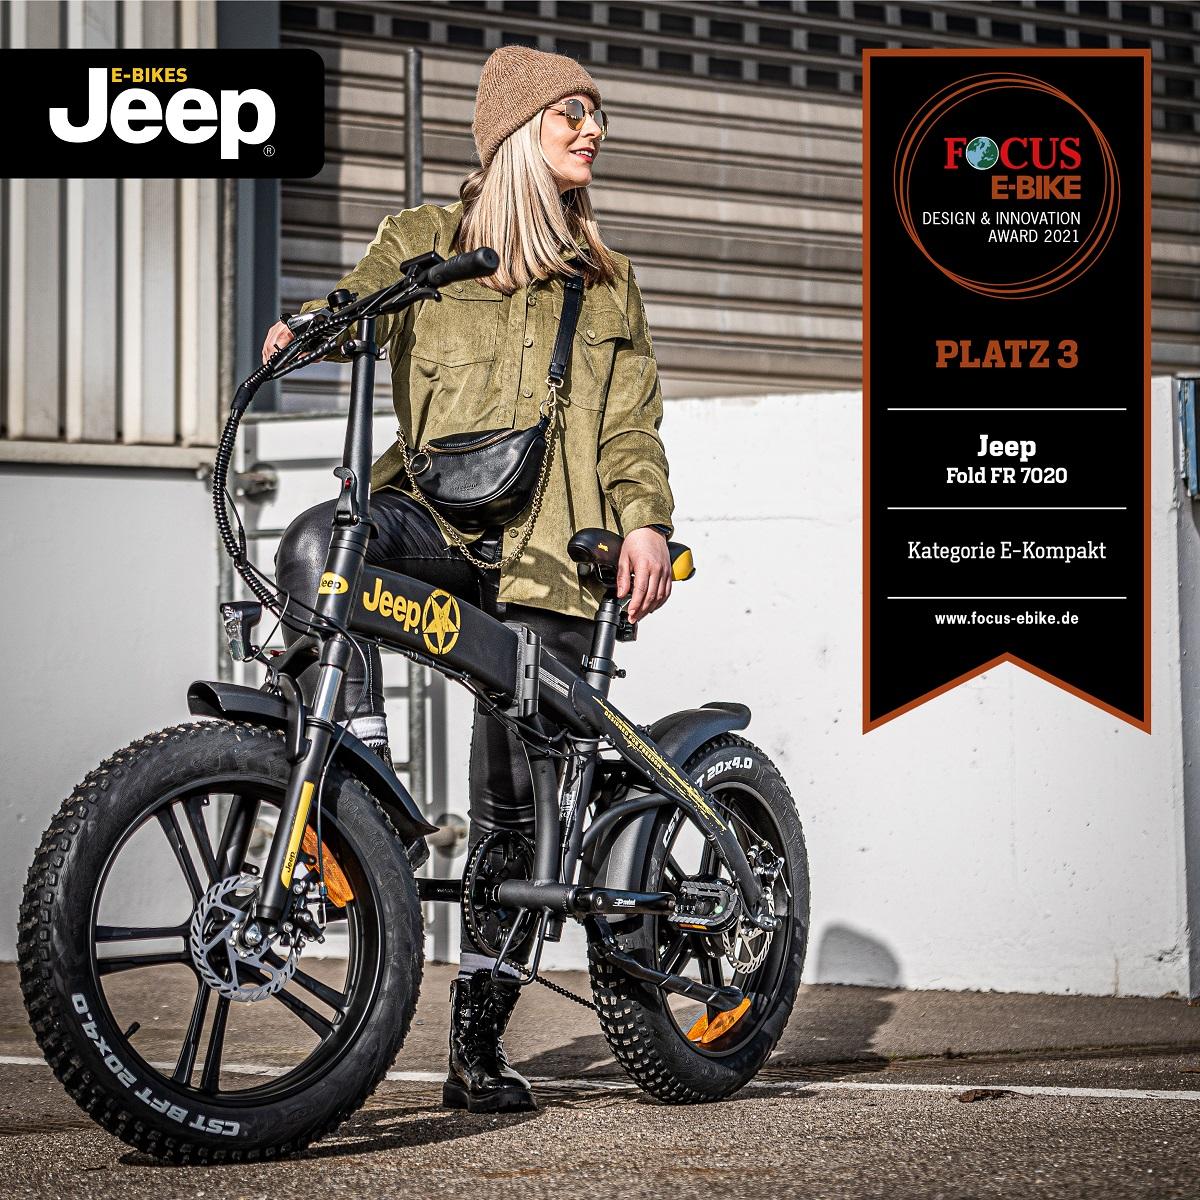 FOCUS Design Award 2021: Platz 3 für Jeep Fold FAT E-Bike FR 7020 in der Kategorie Kompakt.